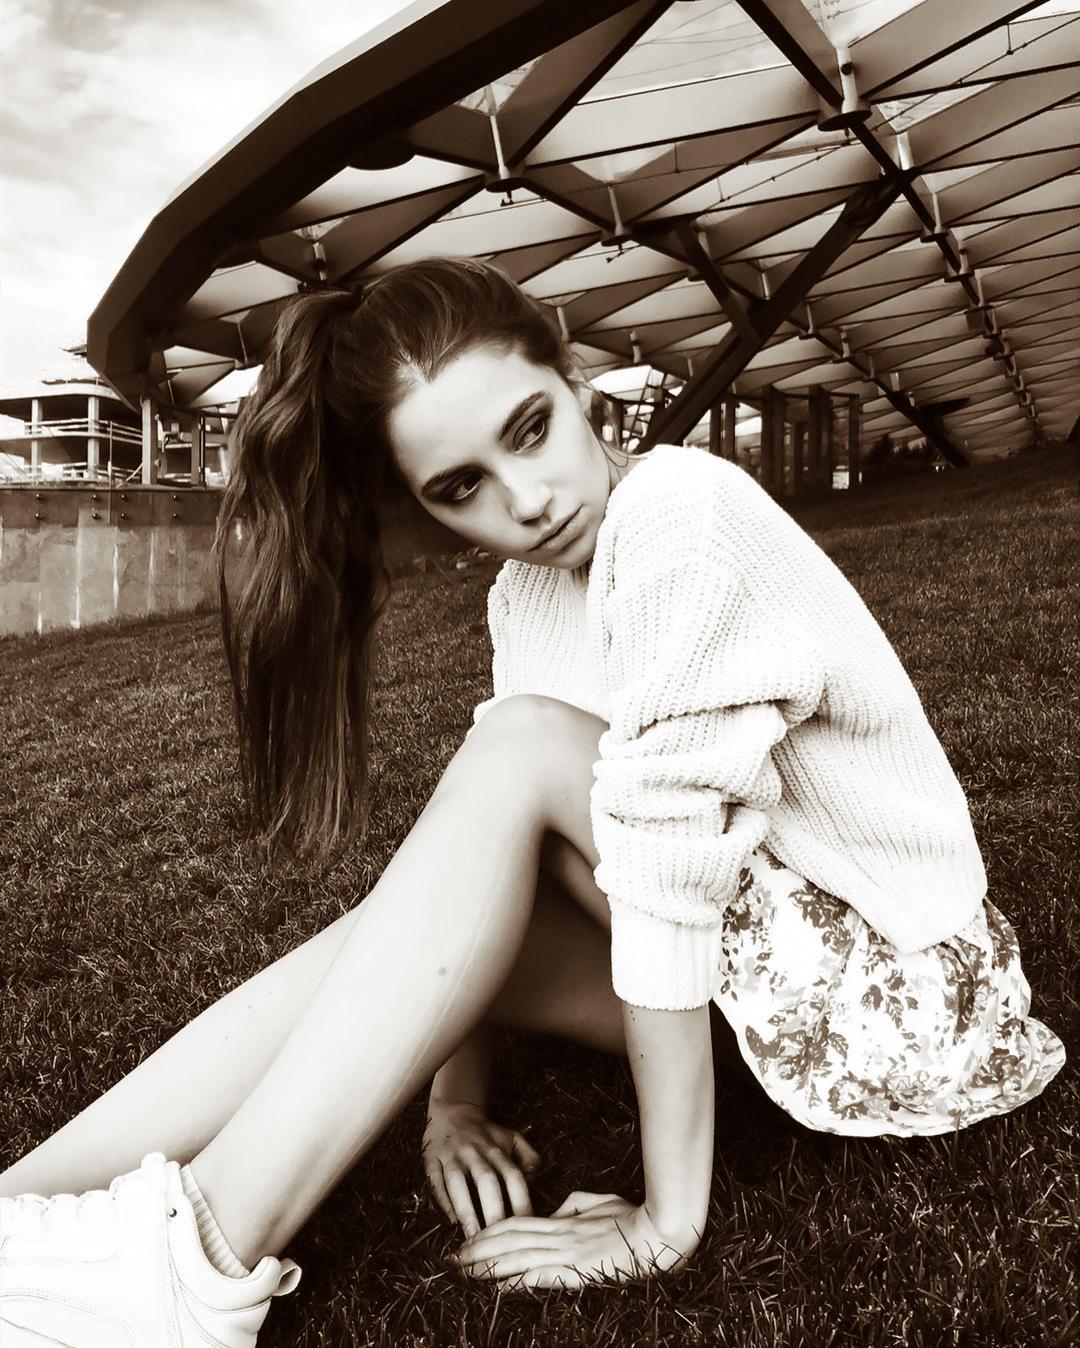 Ksenia Kokoreva Women Long Hair Ponytail Looking Away Legs Sneakers Grass Monochrome Sepia 1080x1348